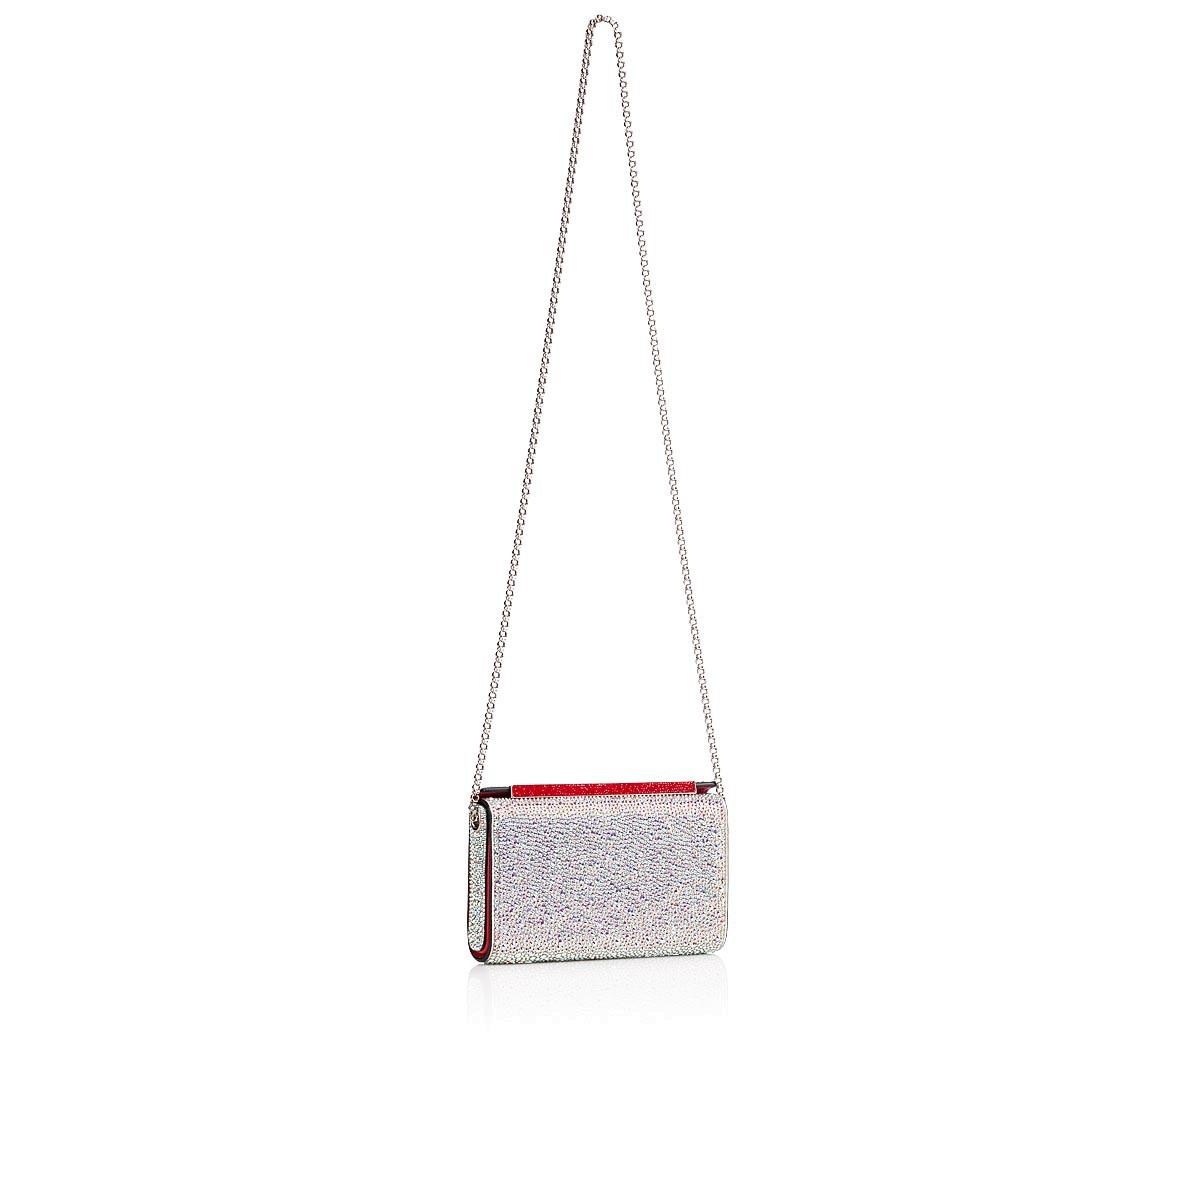 Bags - Vanite Clutch - Christian Louboutin